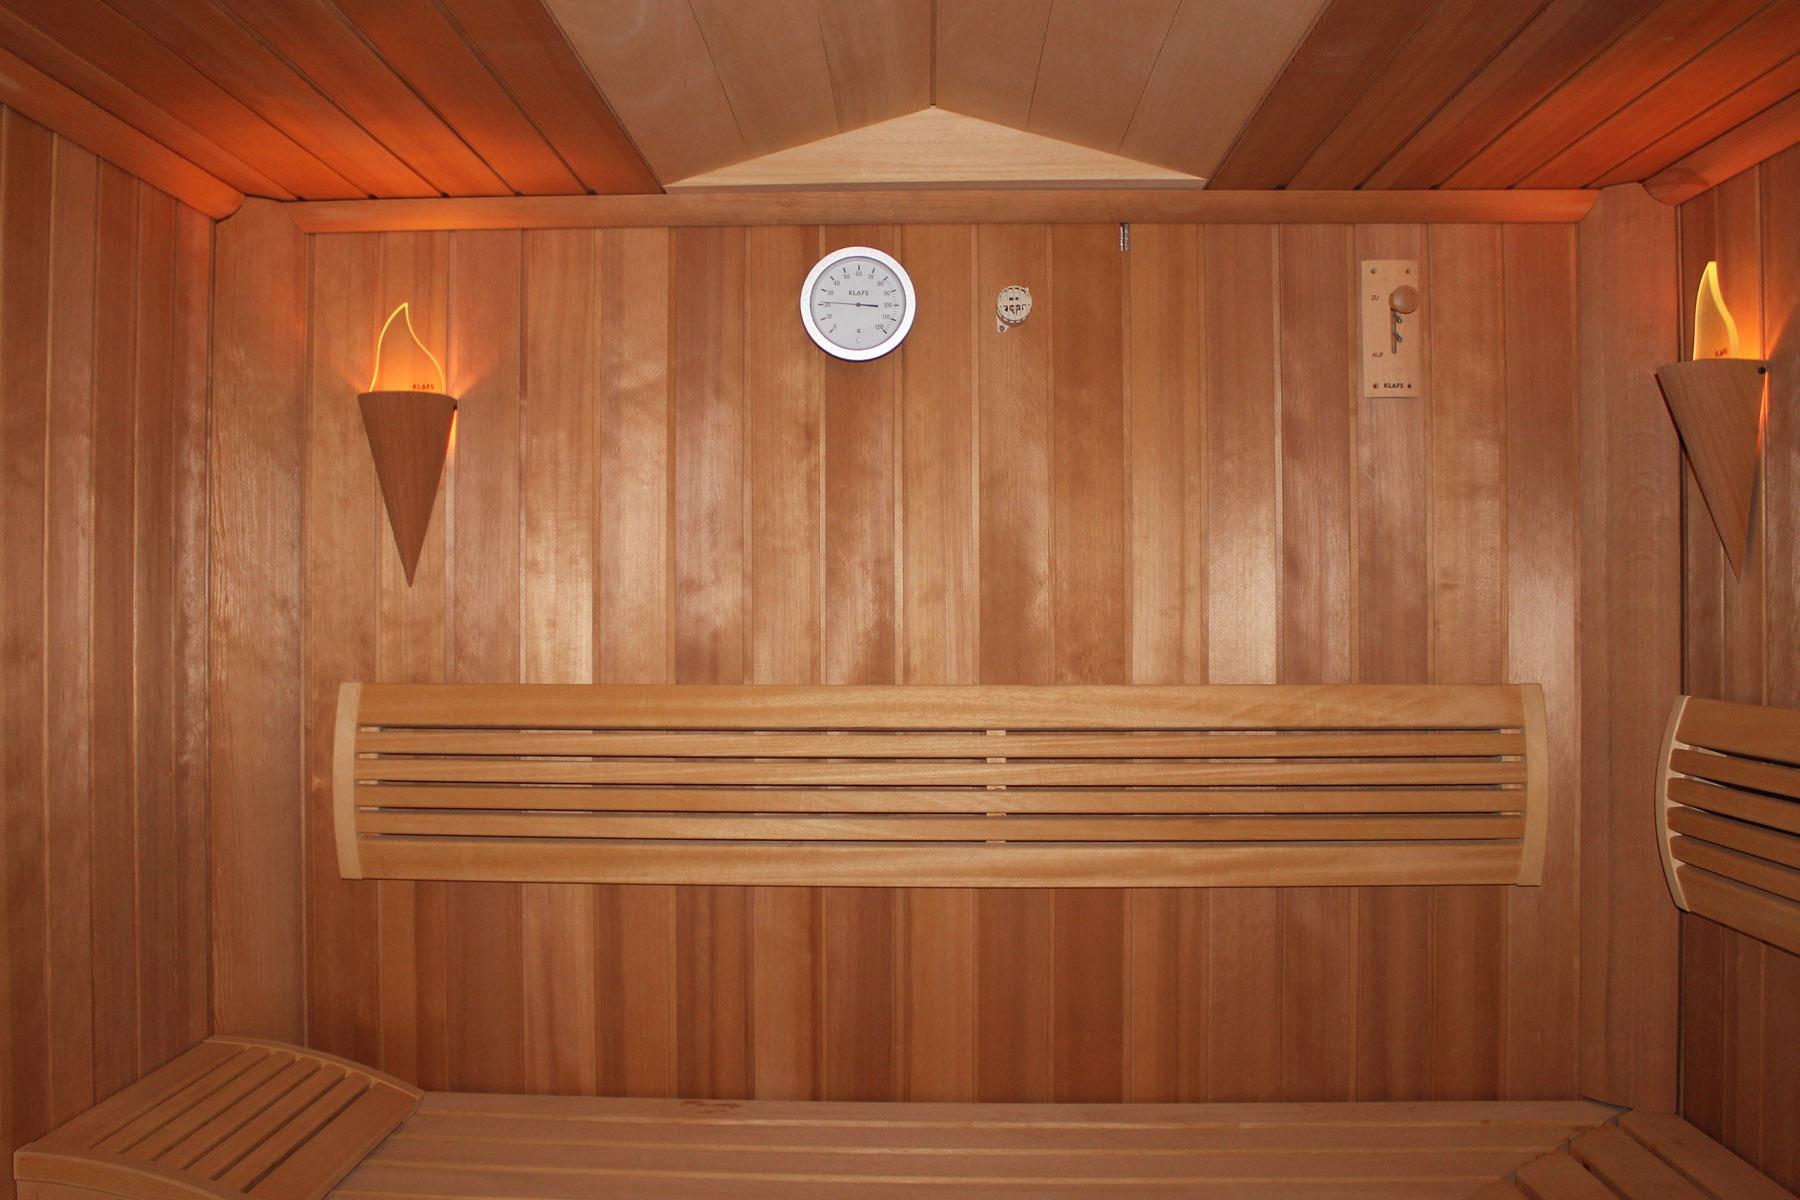 saunabau sauna oder infrarotkabine artec artec schwimmbadtechnik. Black Bedroom Furniture Sets. Home Design Ideas